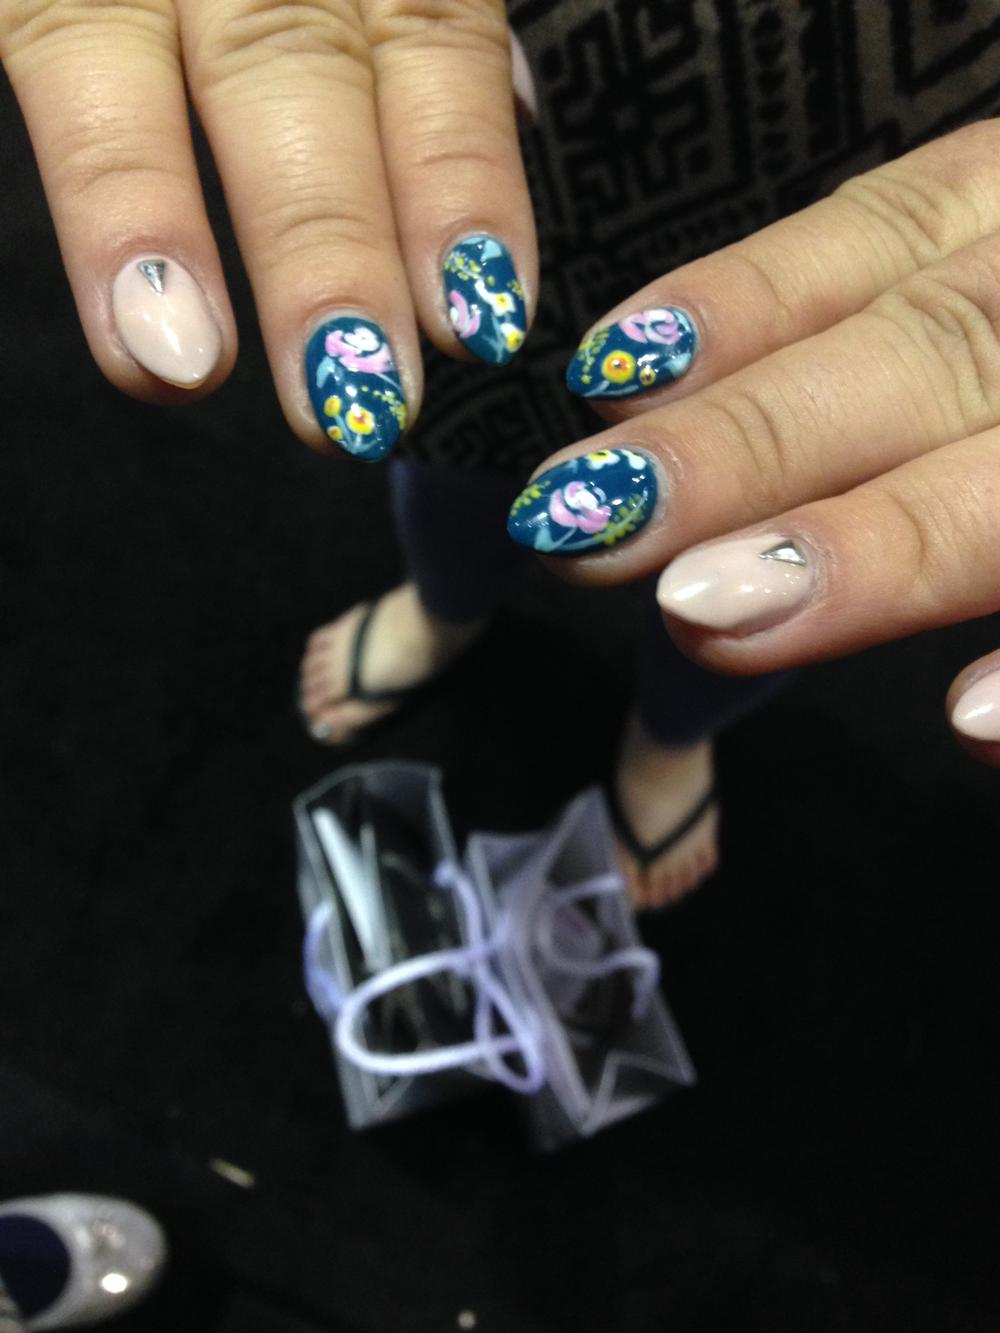 <p>Nails by Danielle Lubin</p>